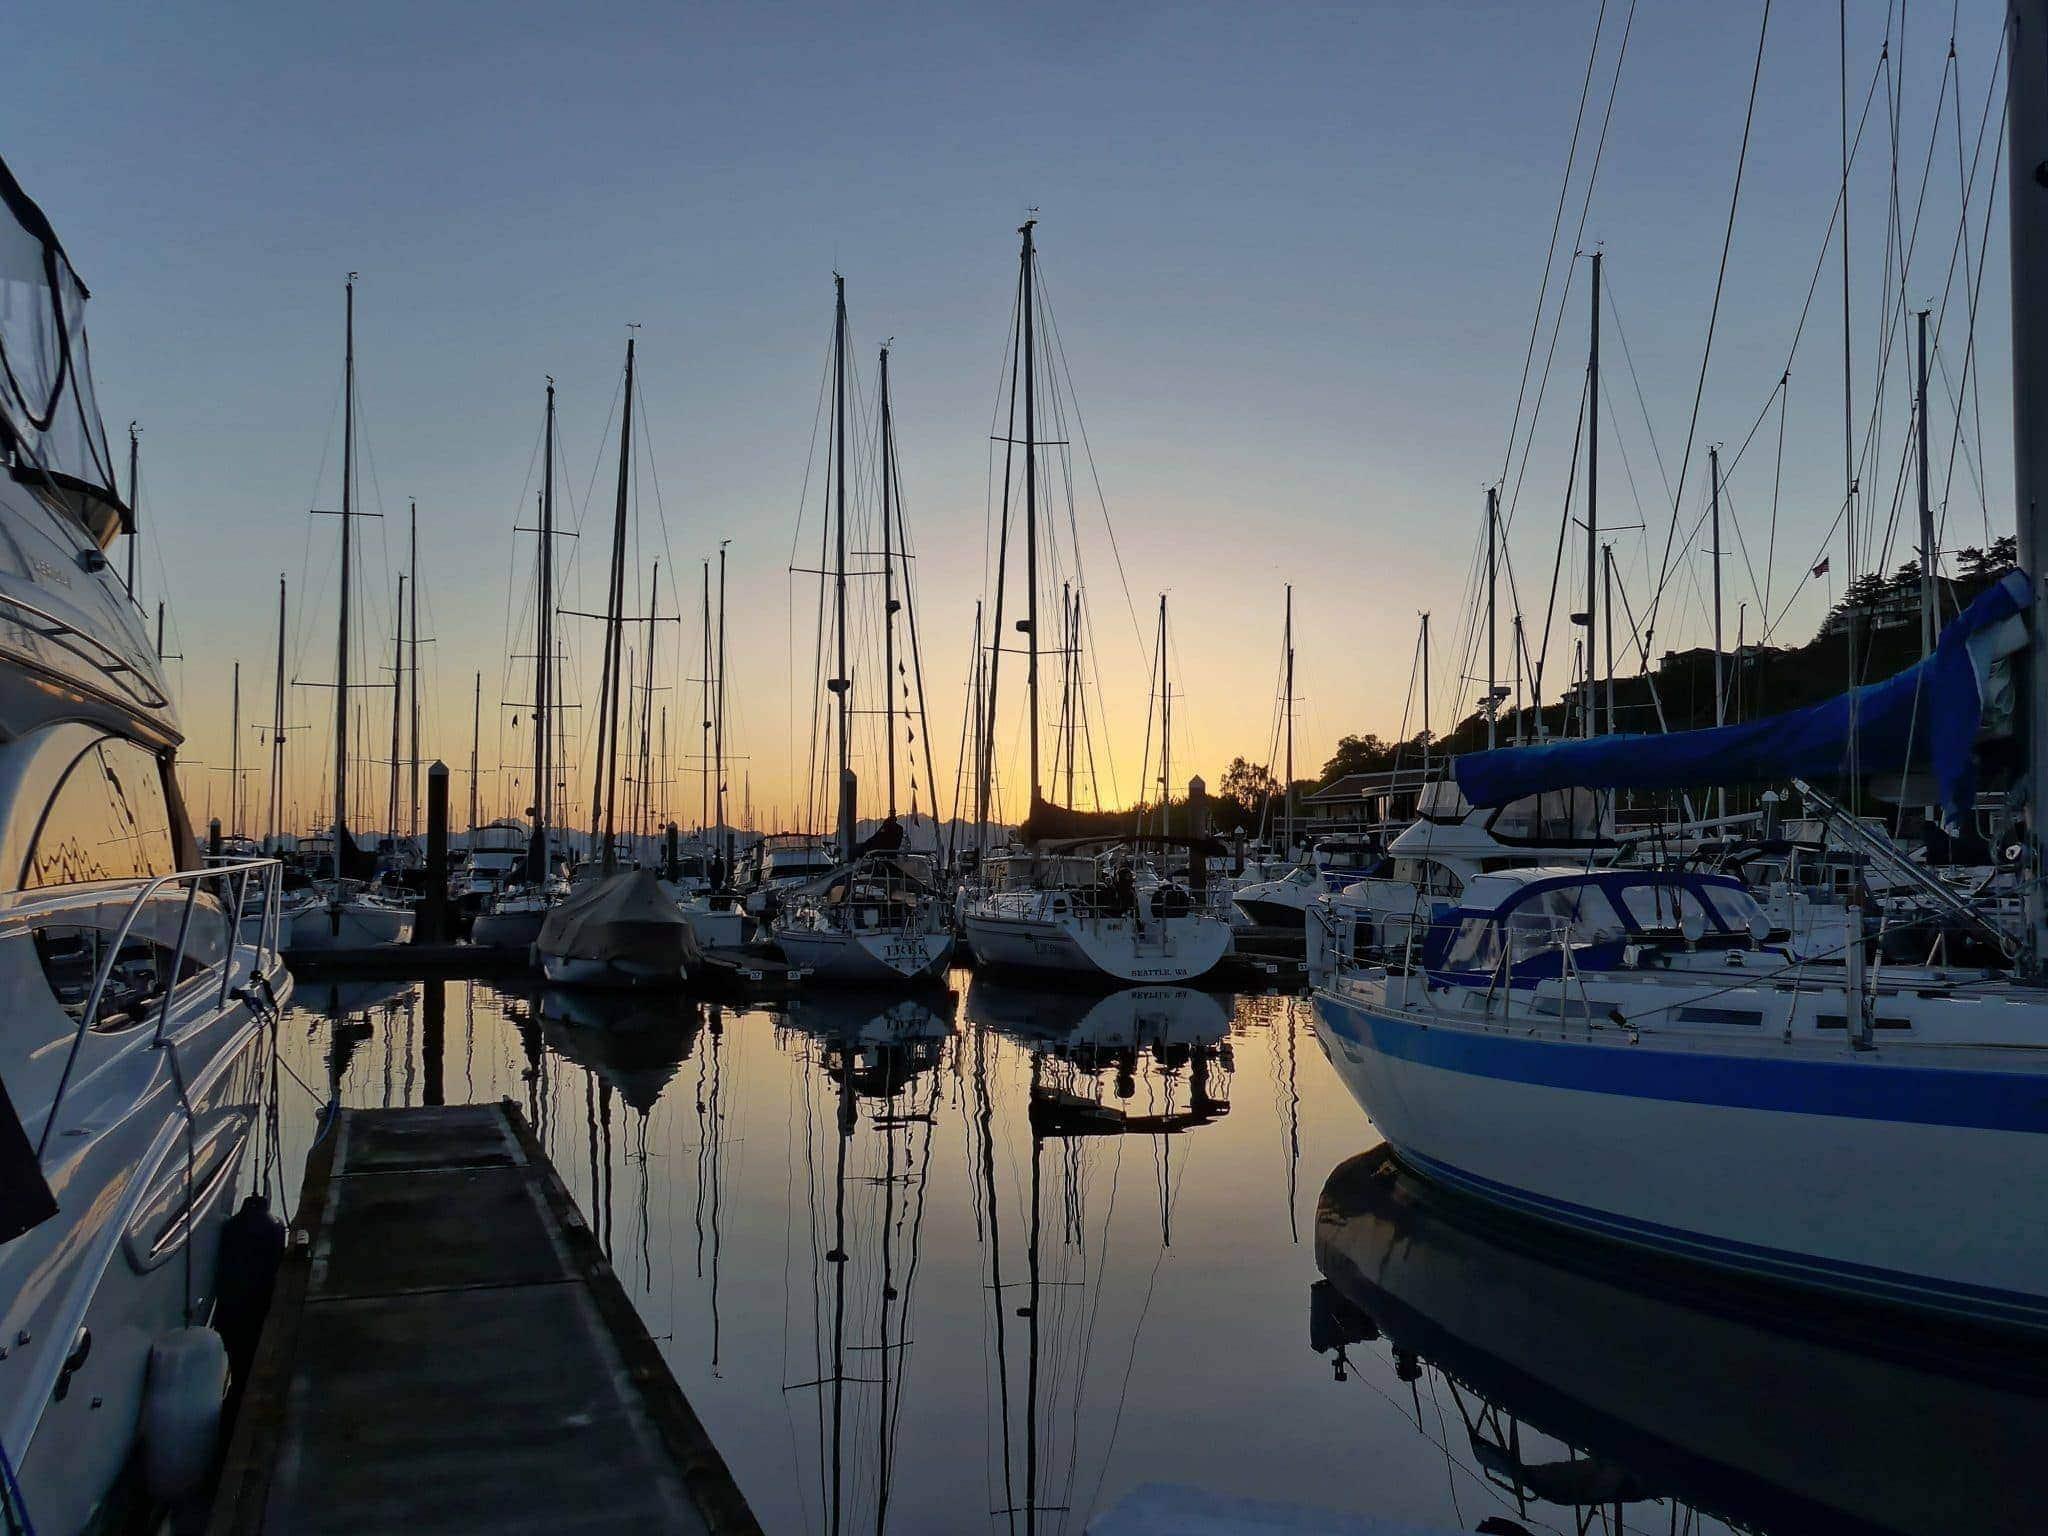 A fantastic sunset